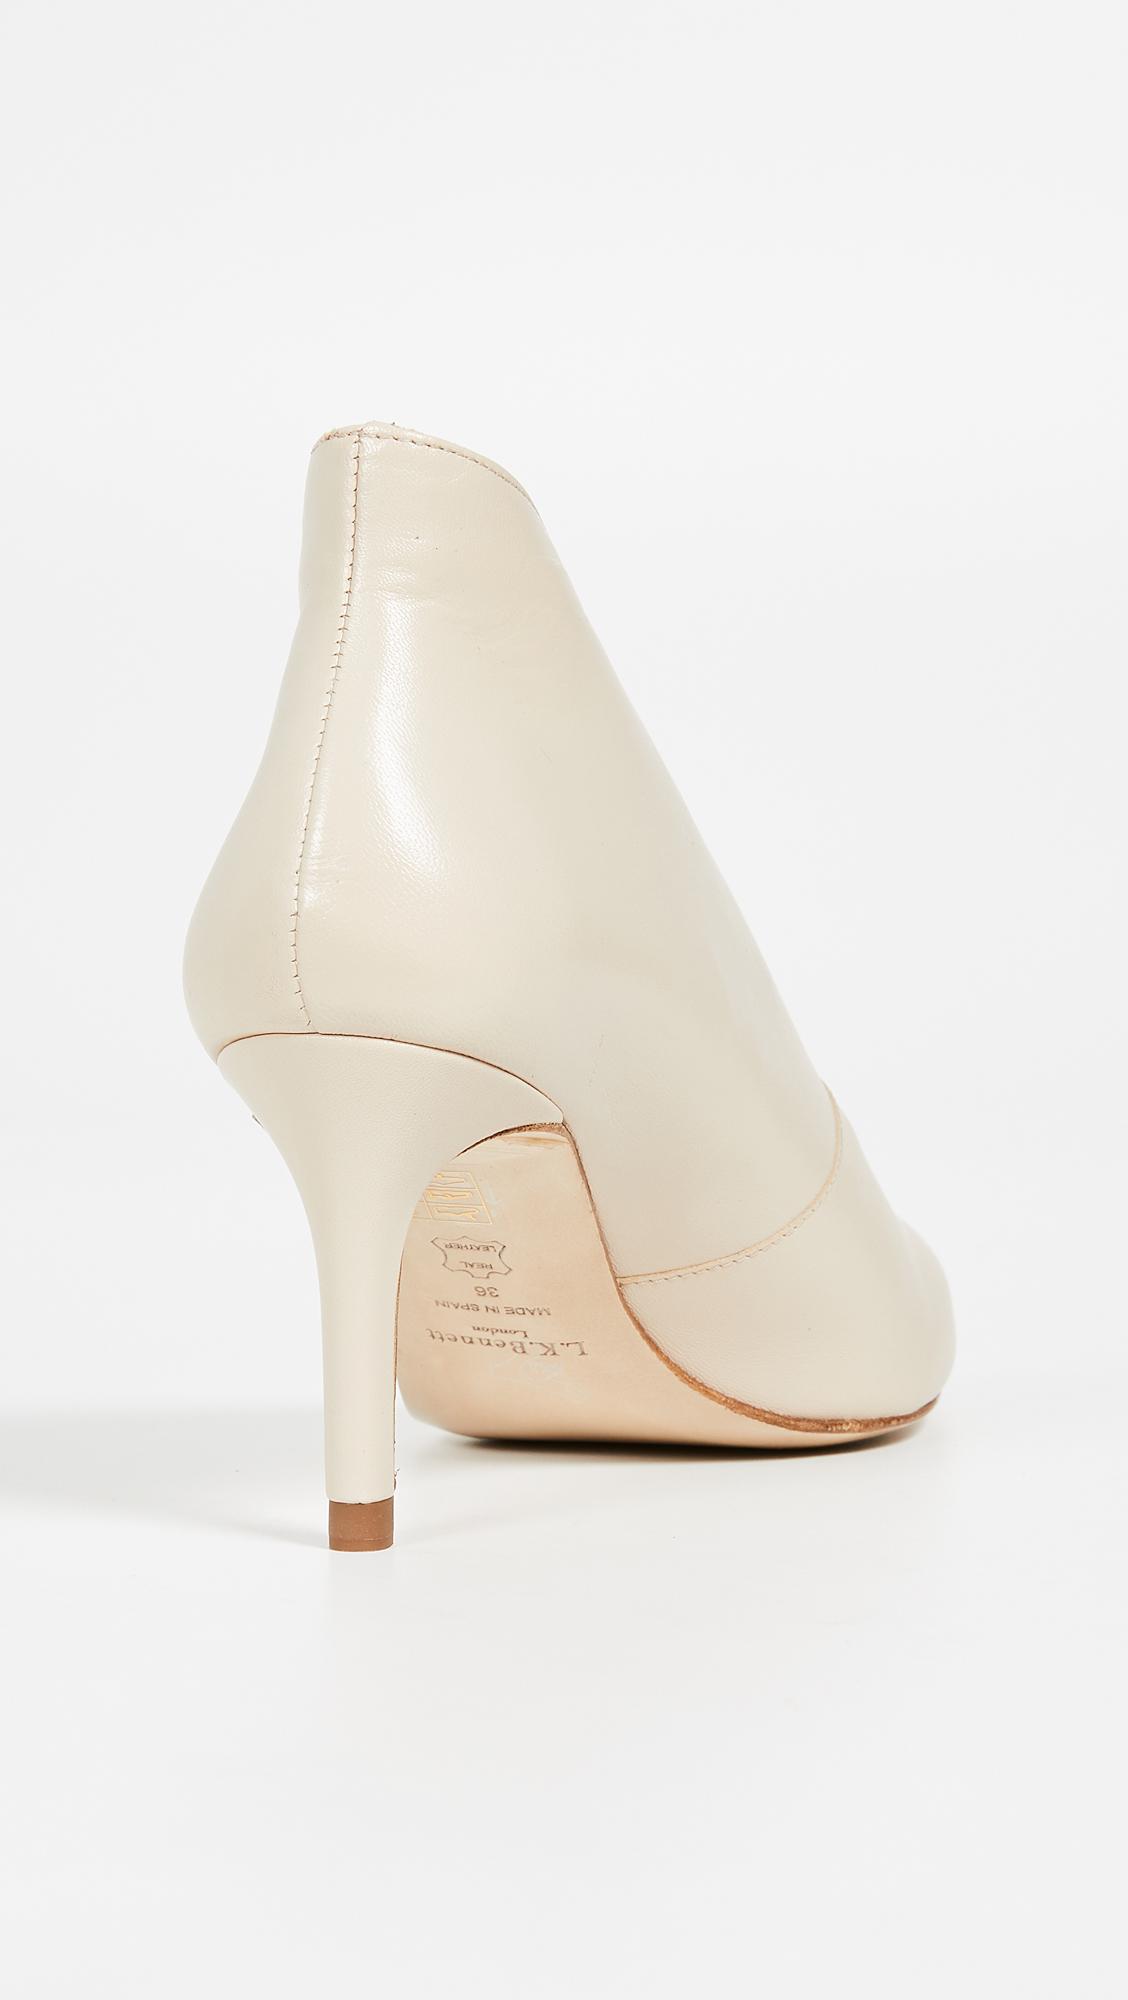 chaussures shopbop l.k. bennett corrina corrina corrina point 4c8826